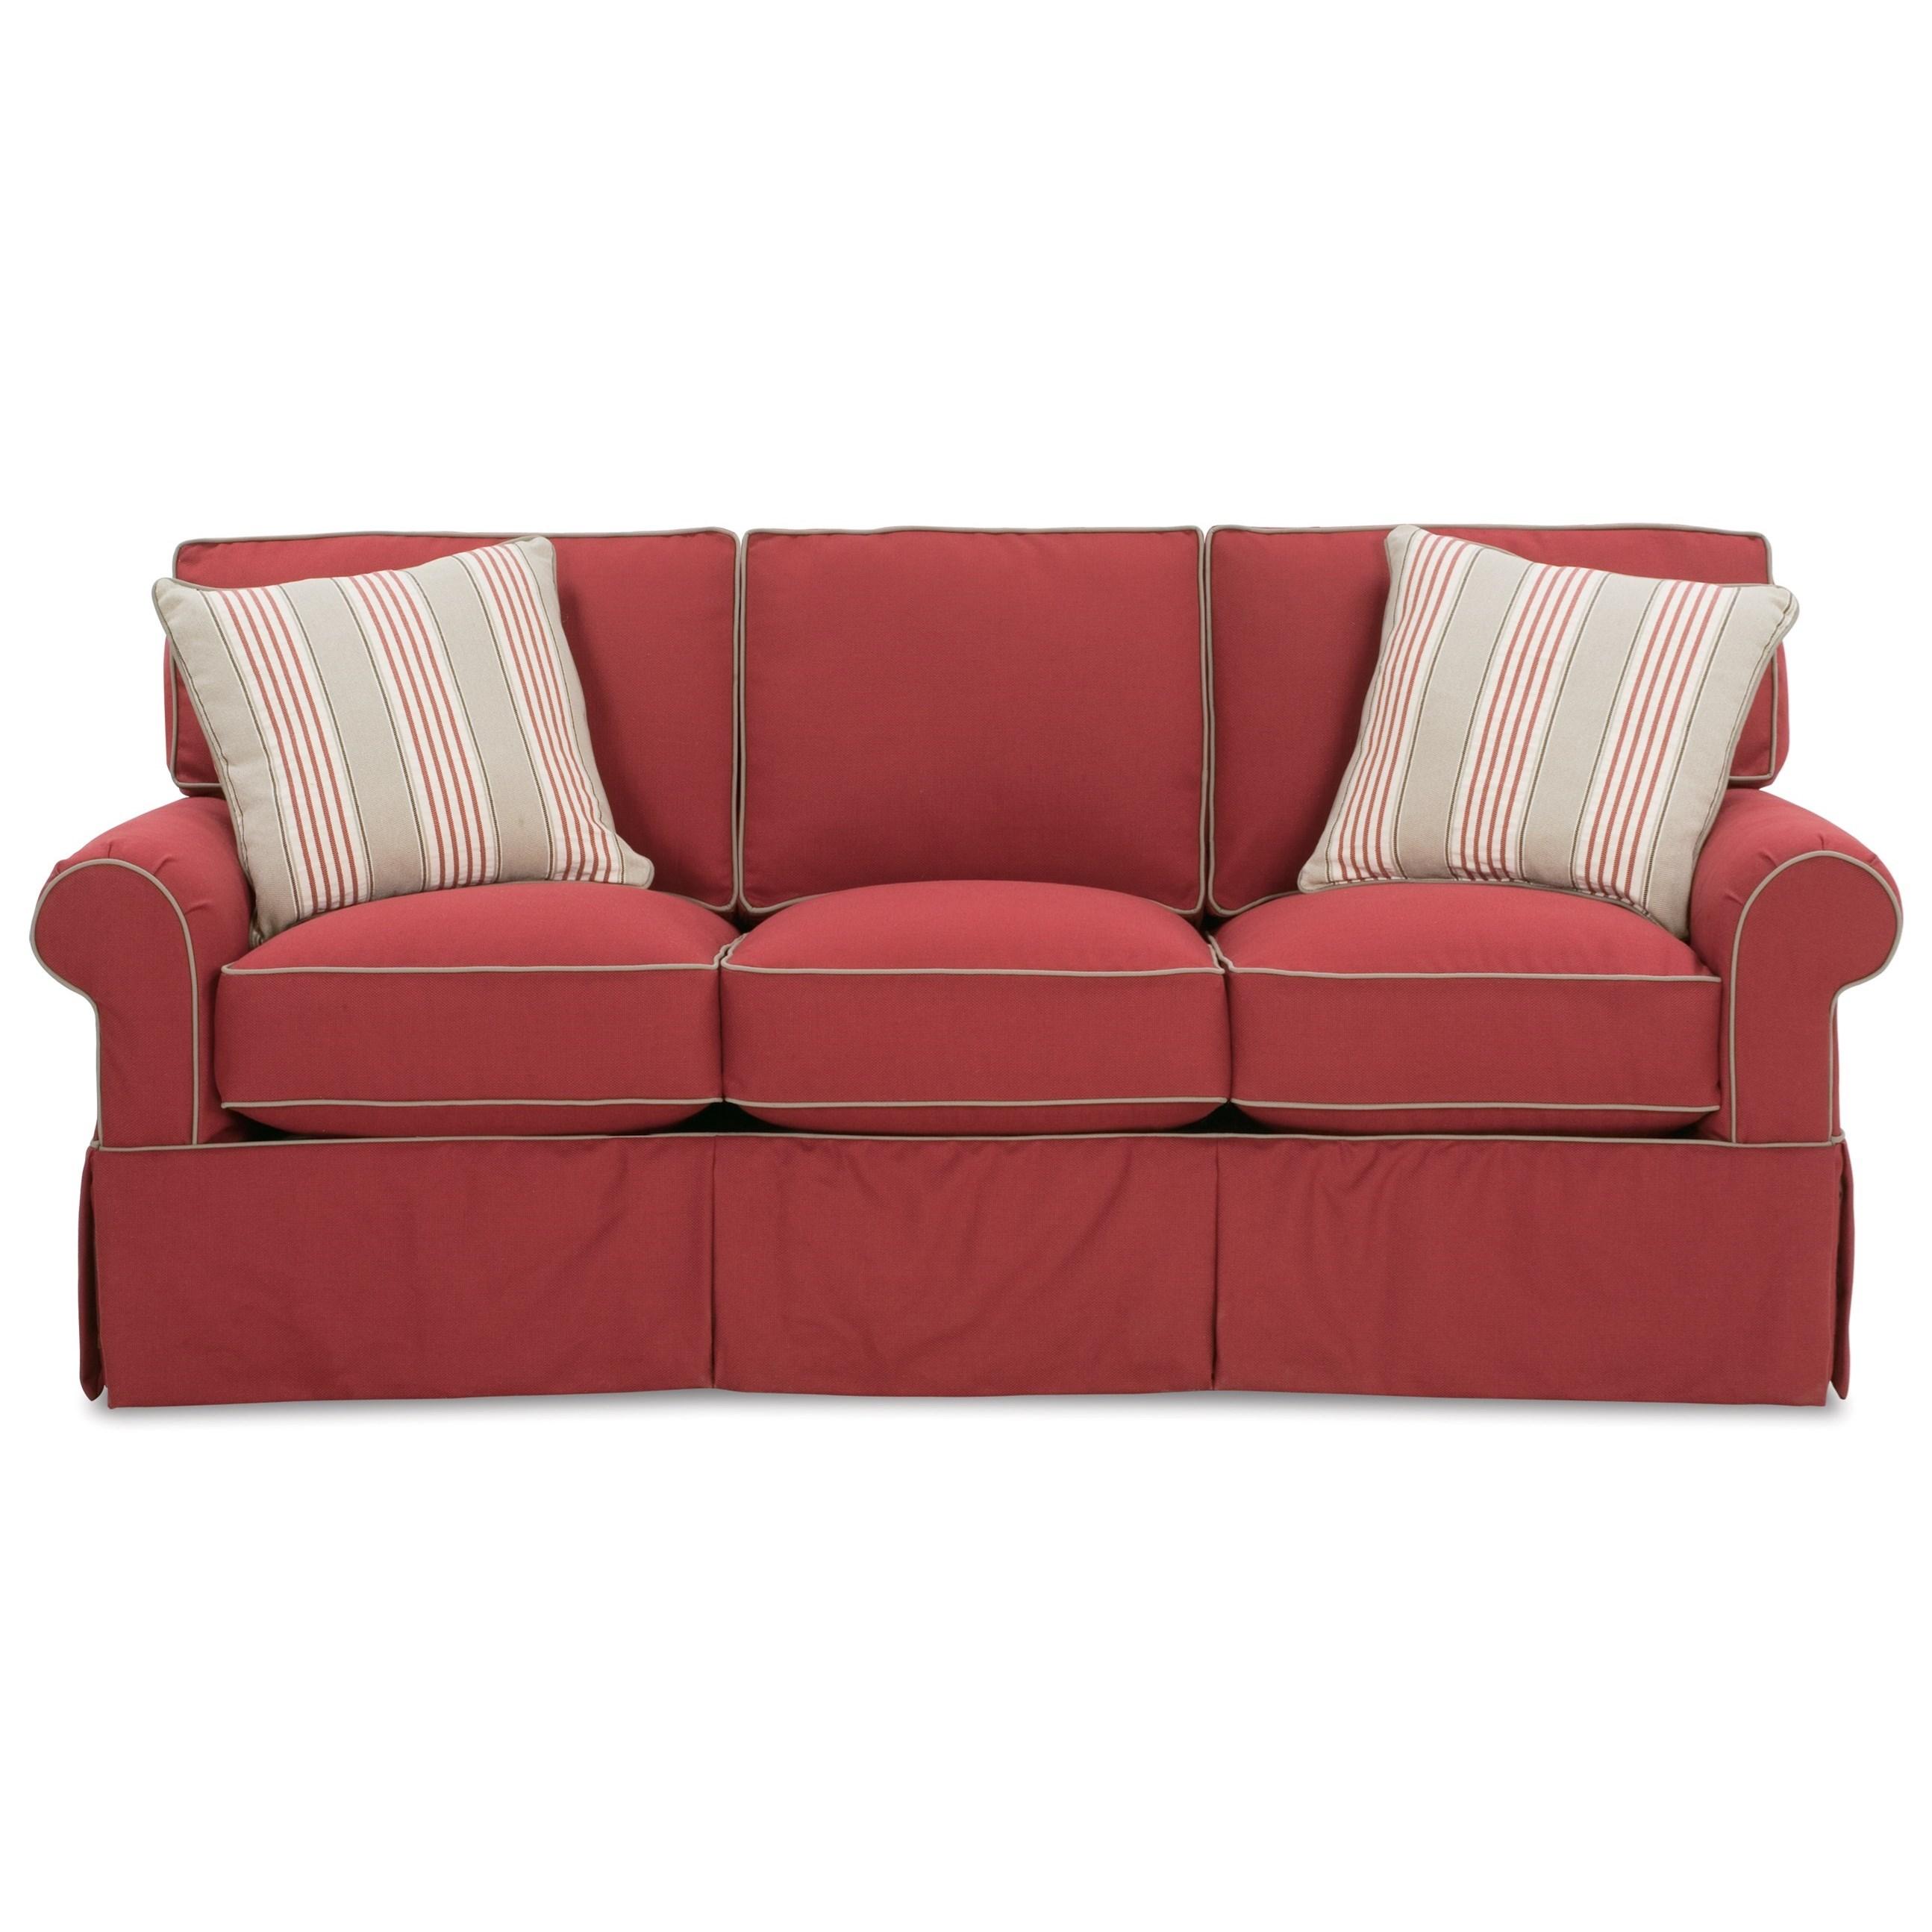 Rowe Hermitage 7880 000 Upholstered Three Seat Sofa Baer